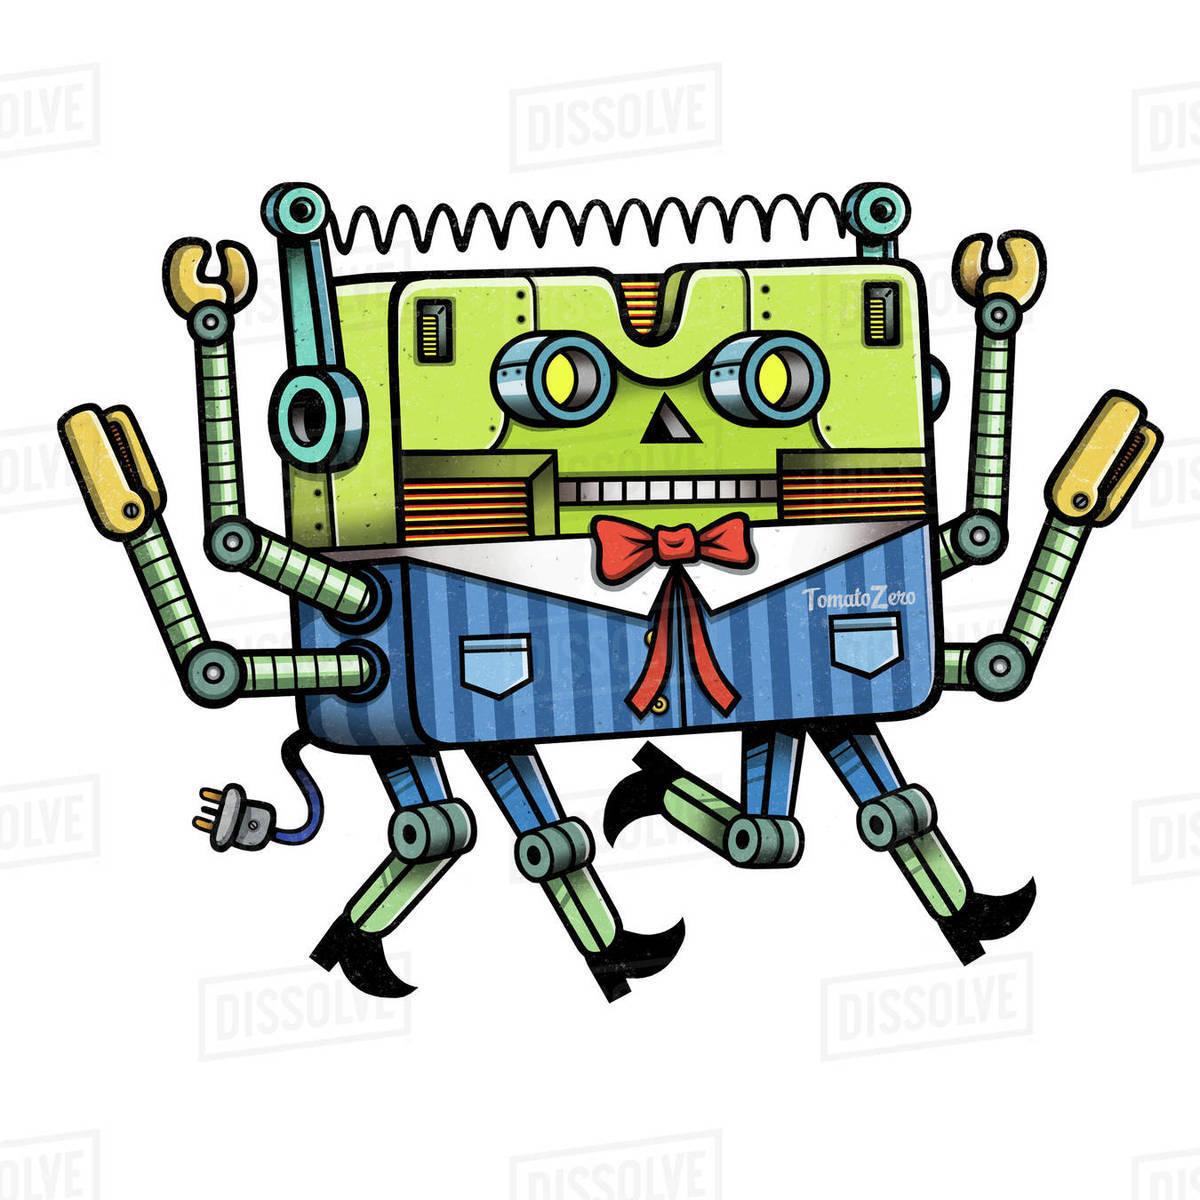 Cartoon illustration of robot worker isolated on white background Royalty-free stock photo